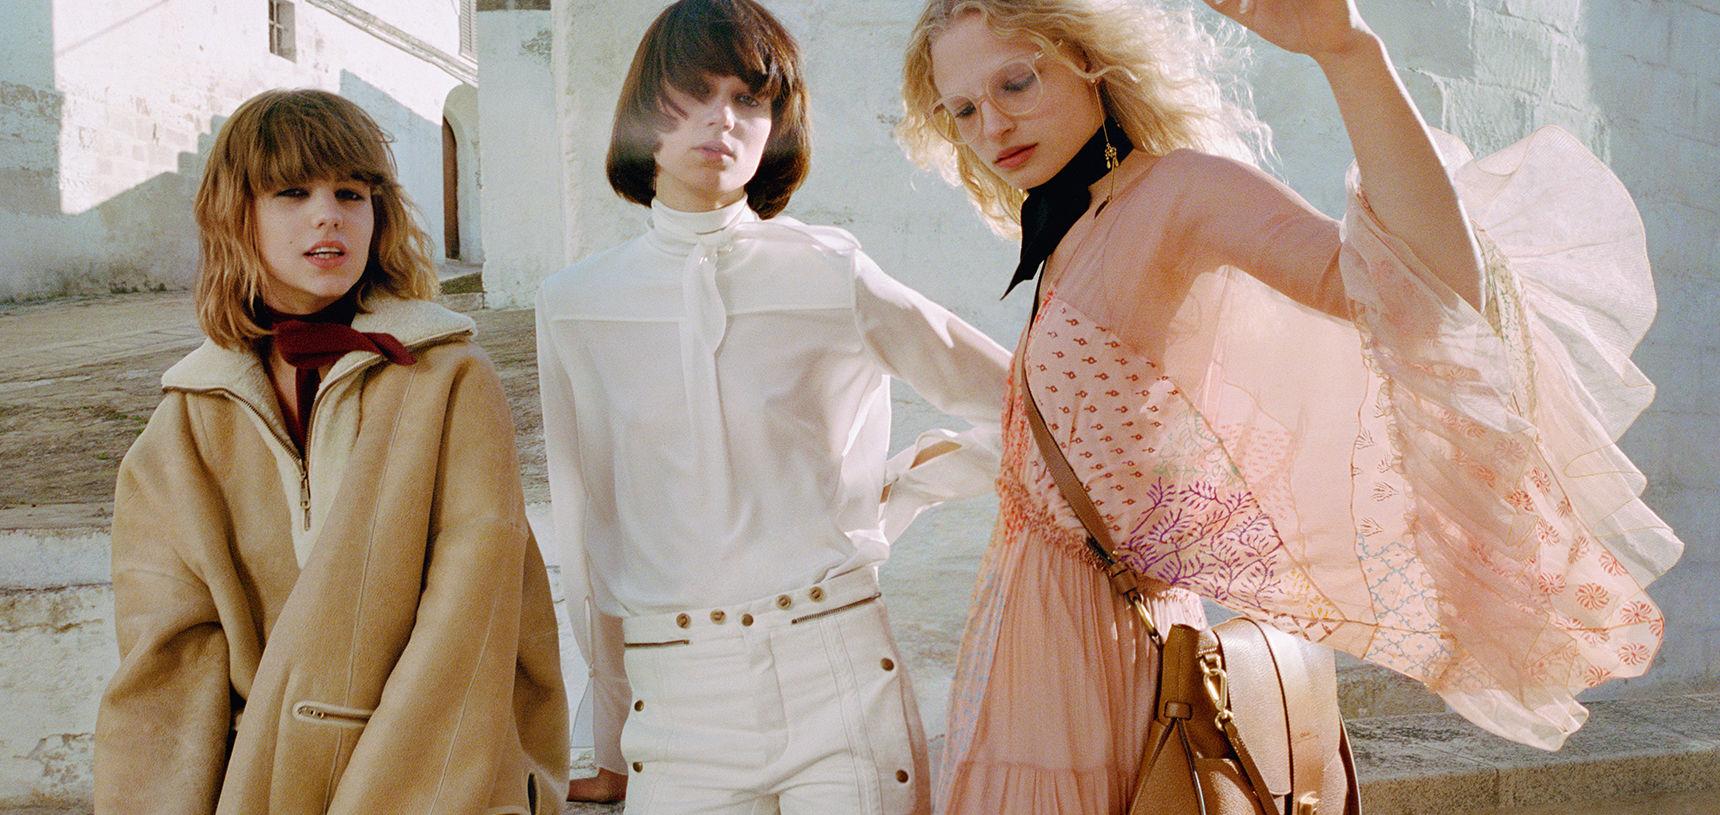 chloe knockoffs - Chlo�� Official Website / Designer clothes, bags, fragrance